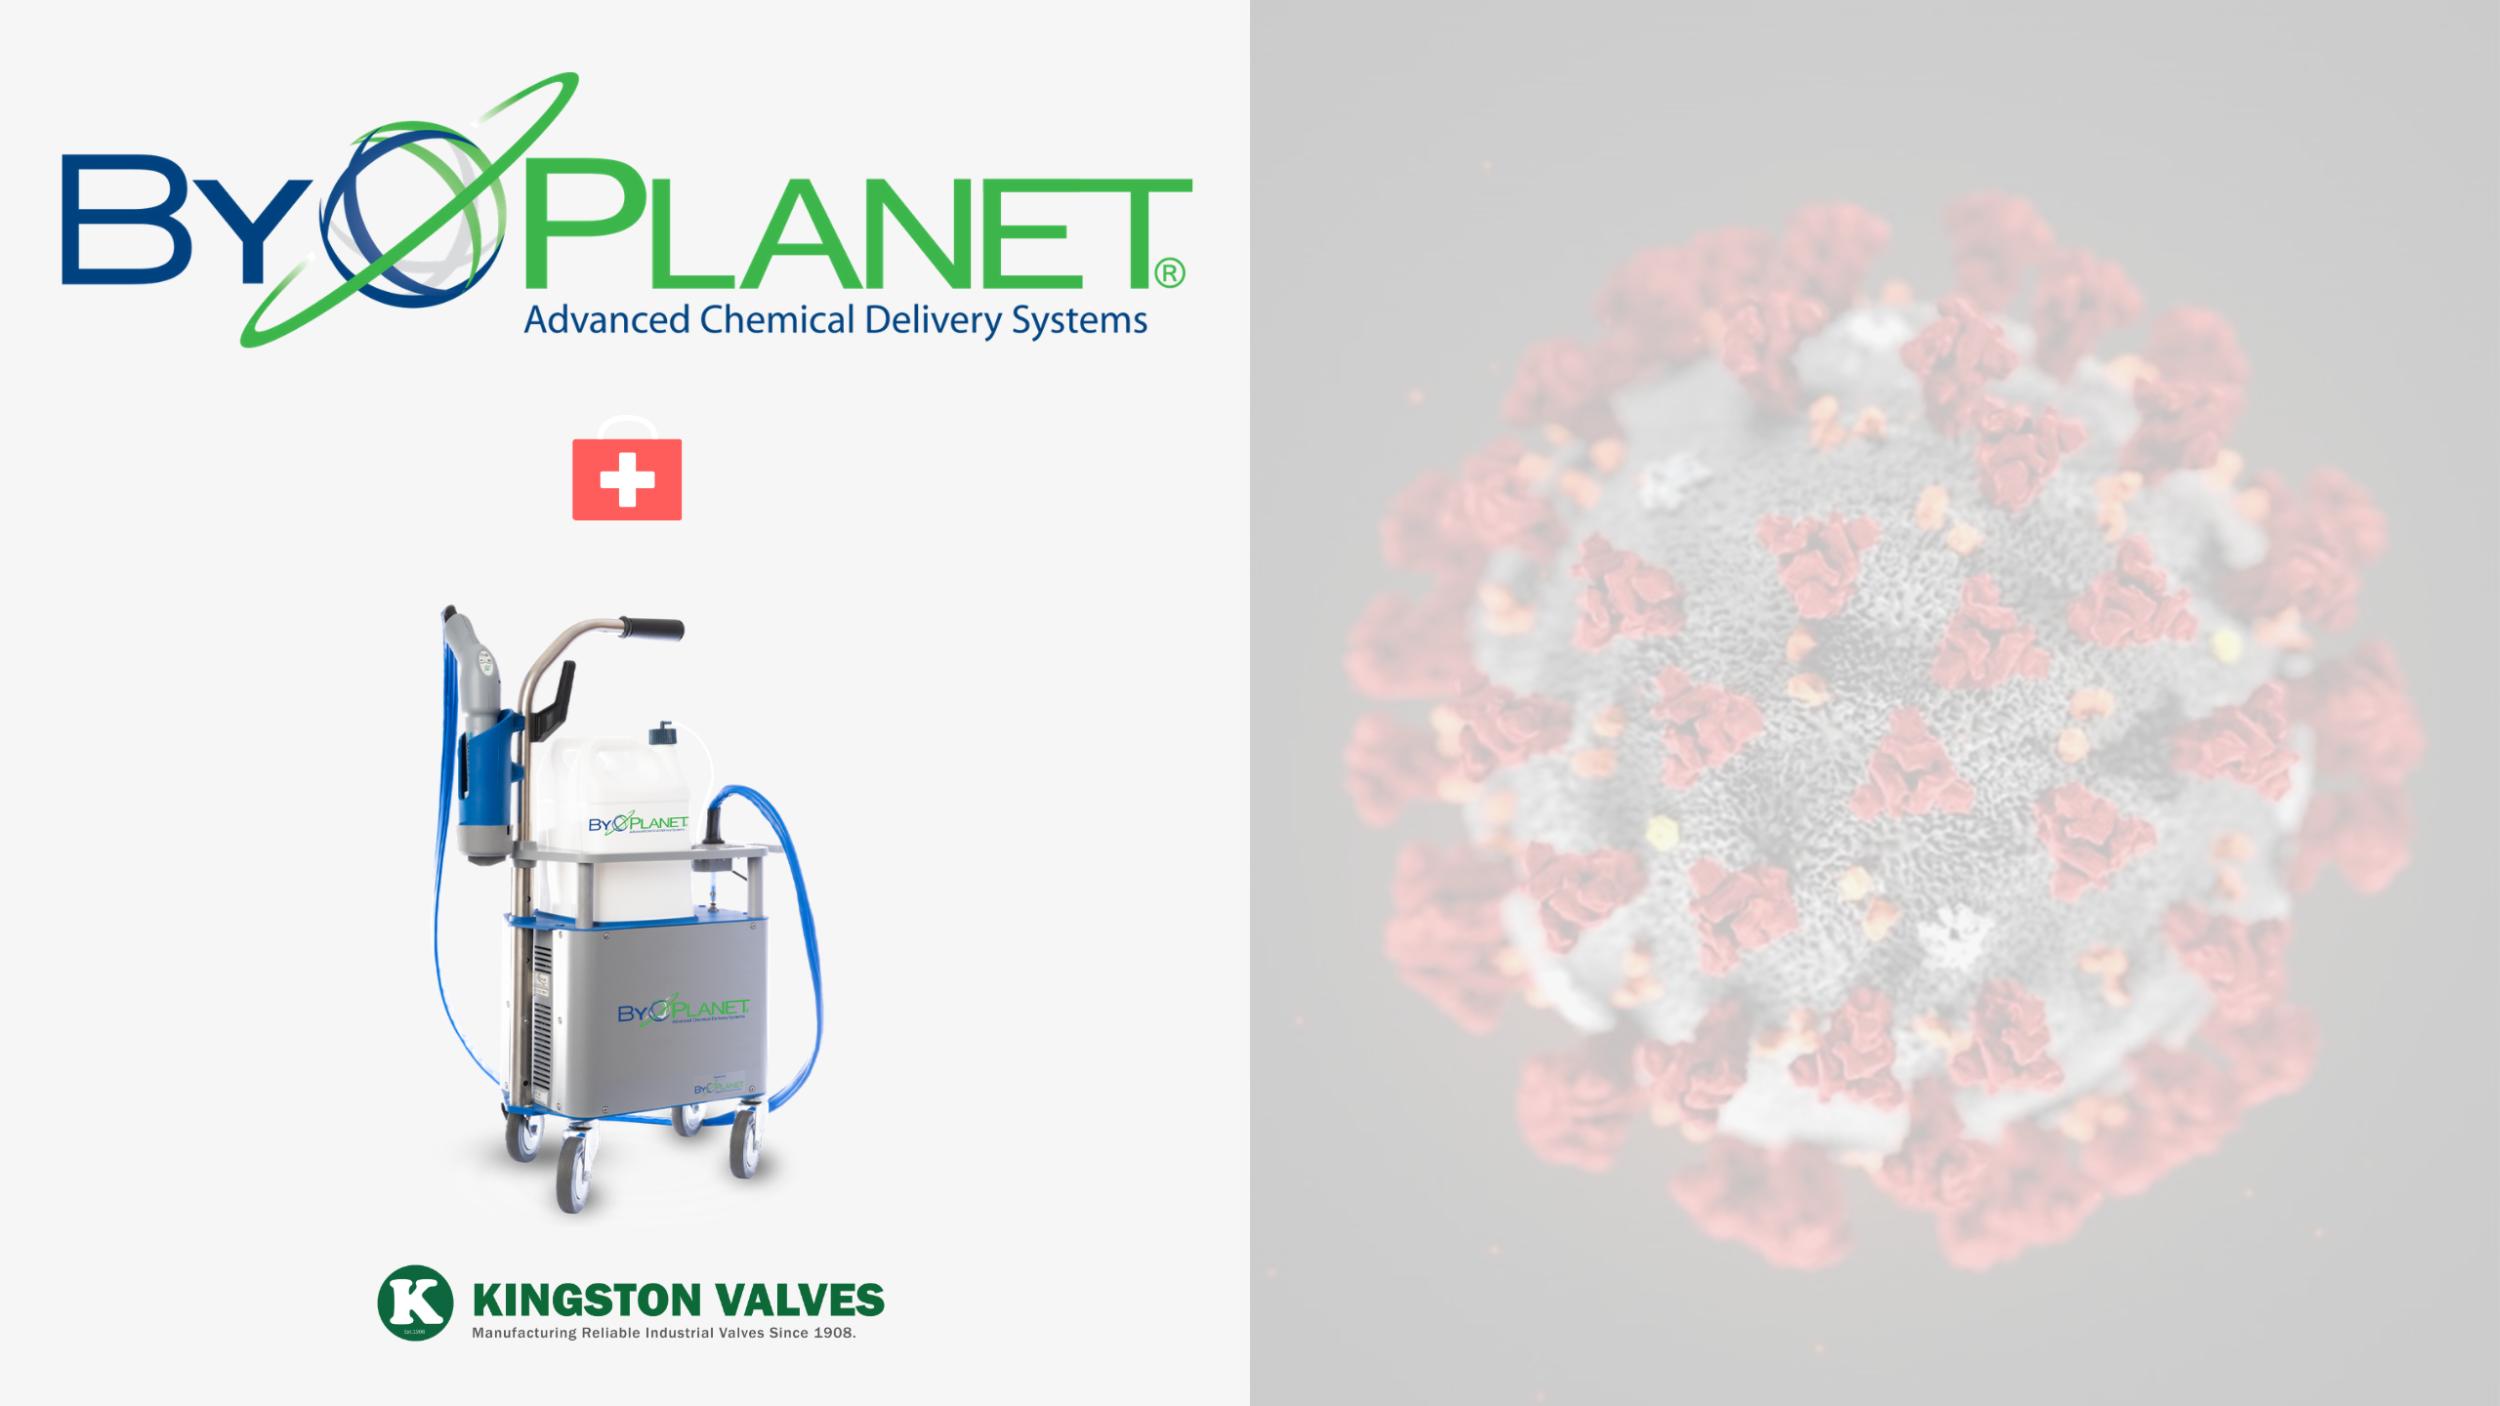 ByoPlanet Kingston Valves Coronavirus